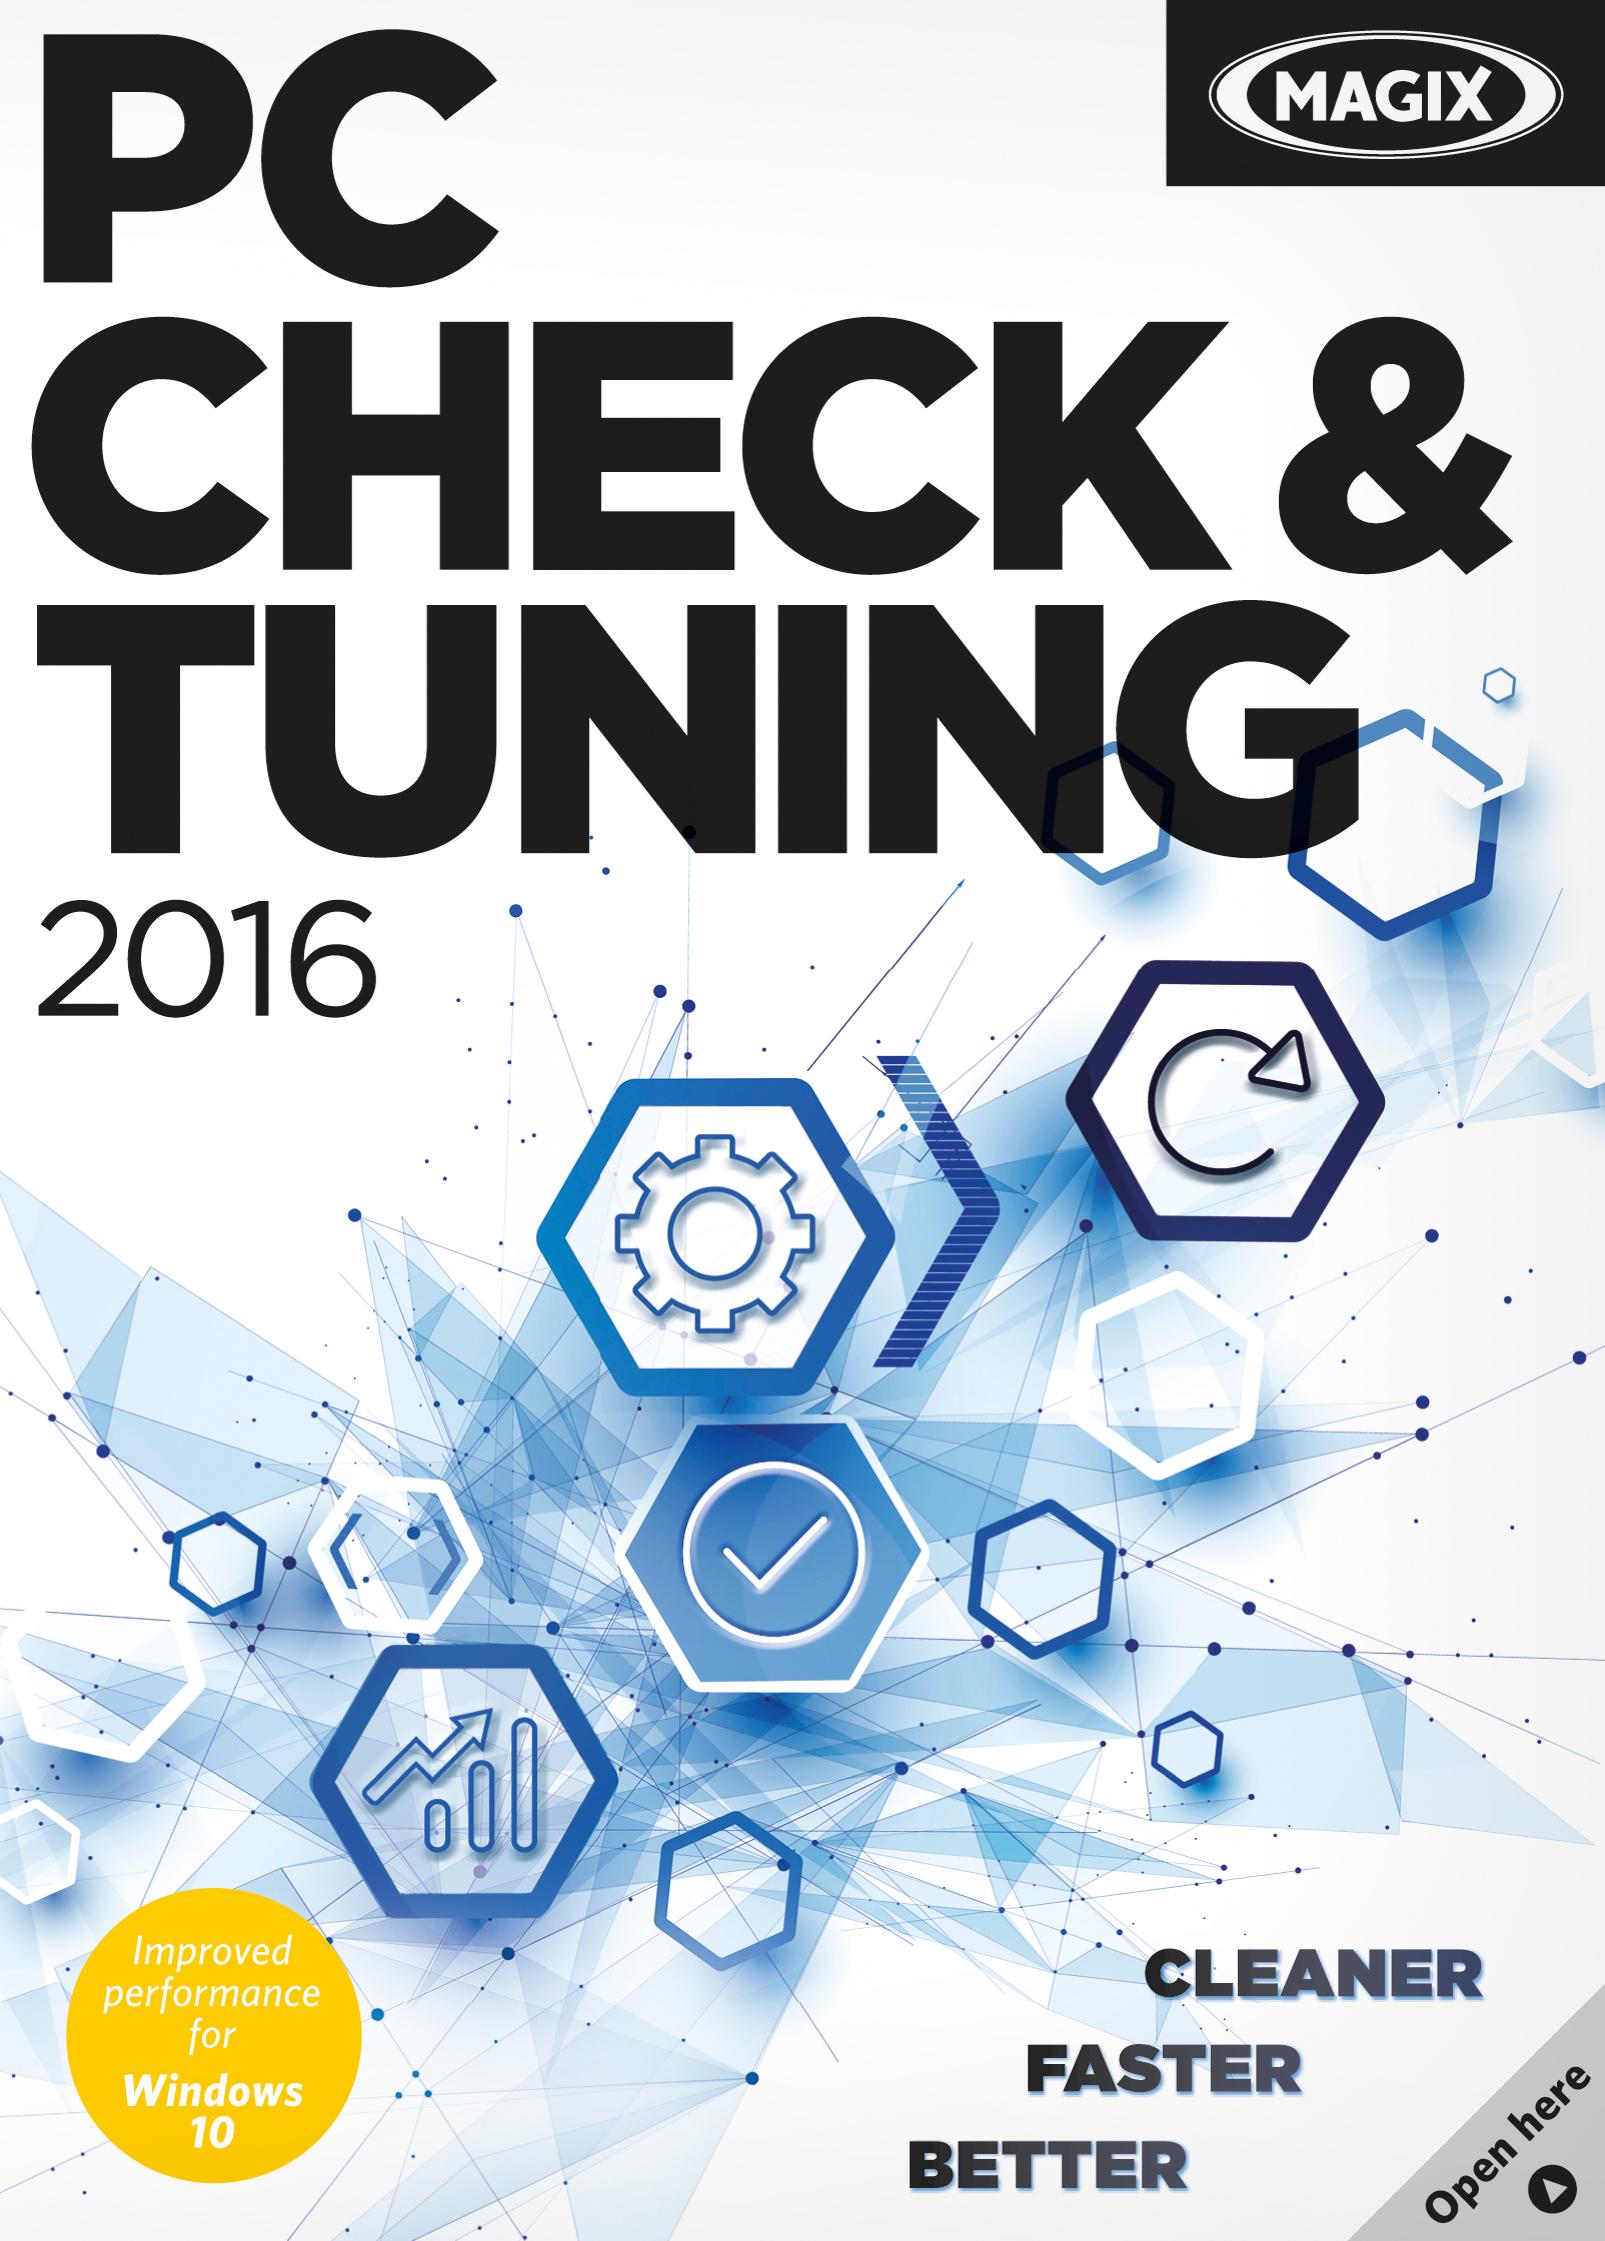 MAGIX PC Check & Tuning 2016 [Download] by MAGIX